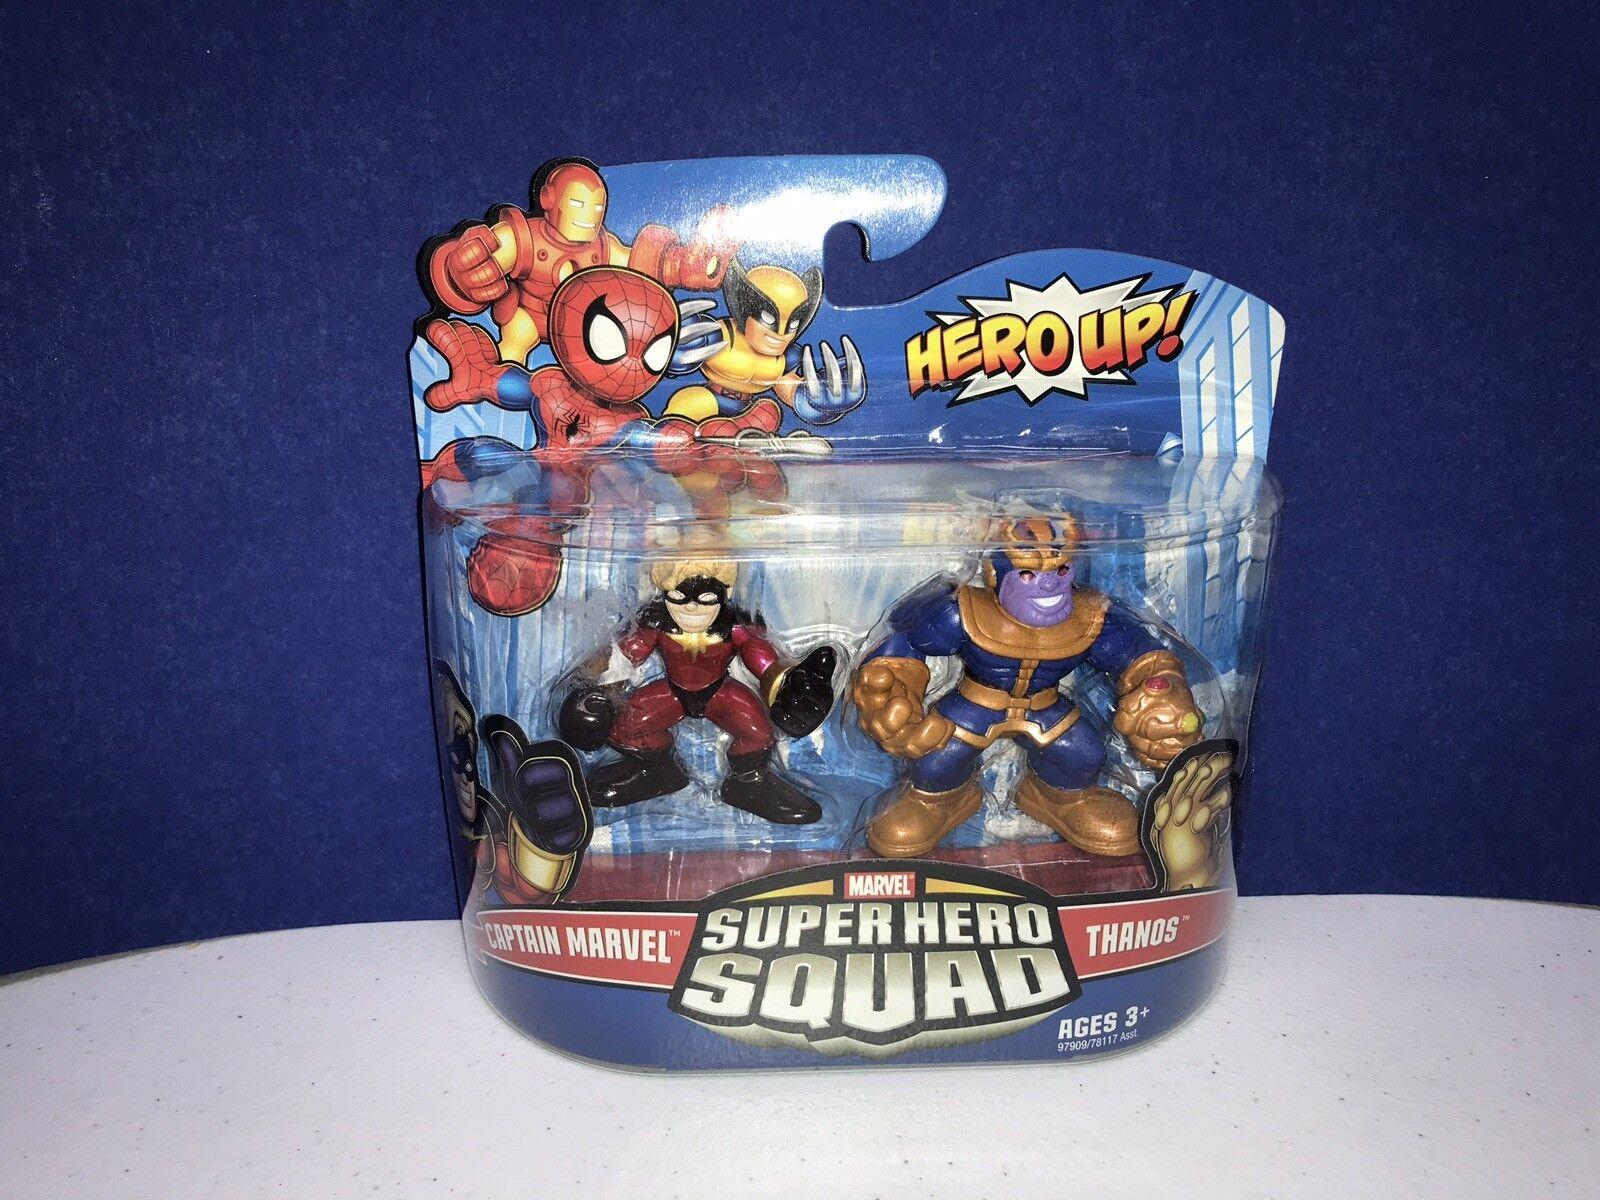 Marvel Super Super Super Hero Squad Captain Marvel Thanos 2009 b0087e